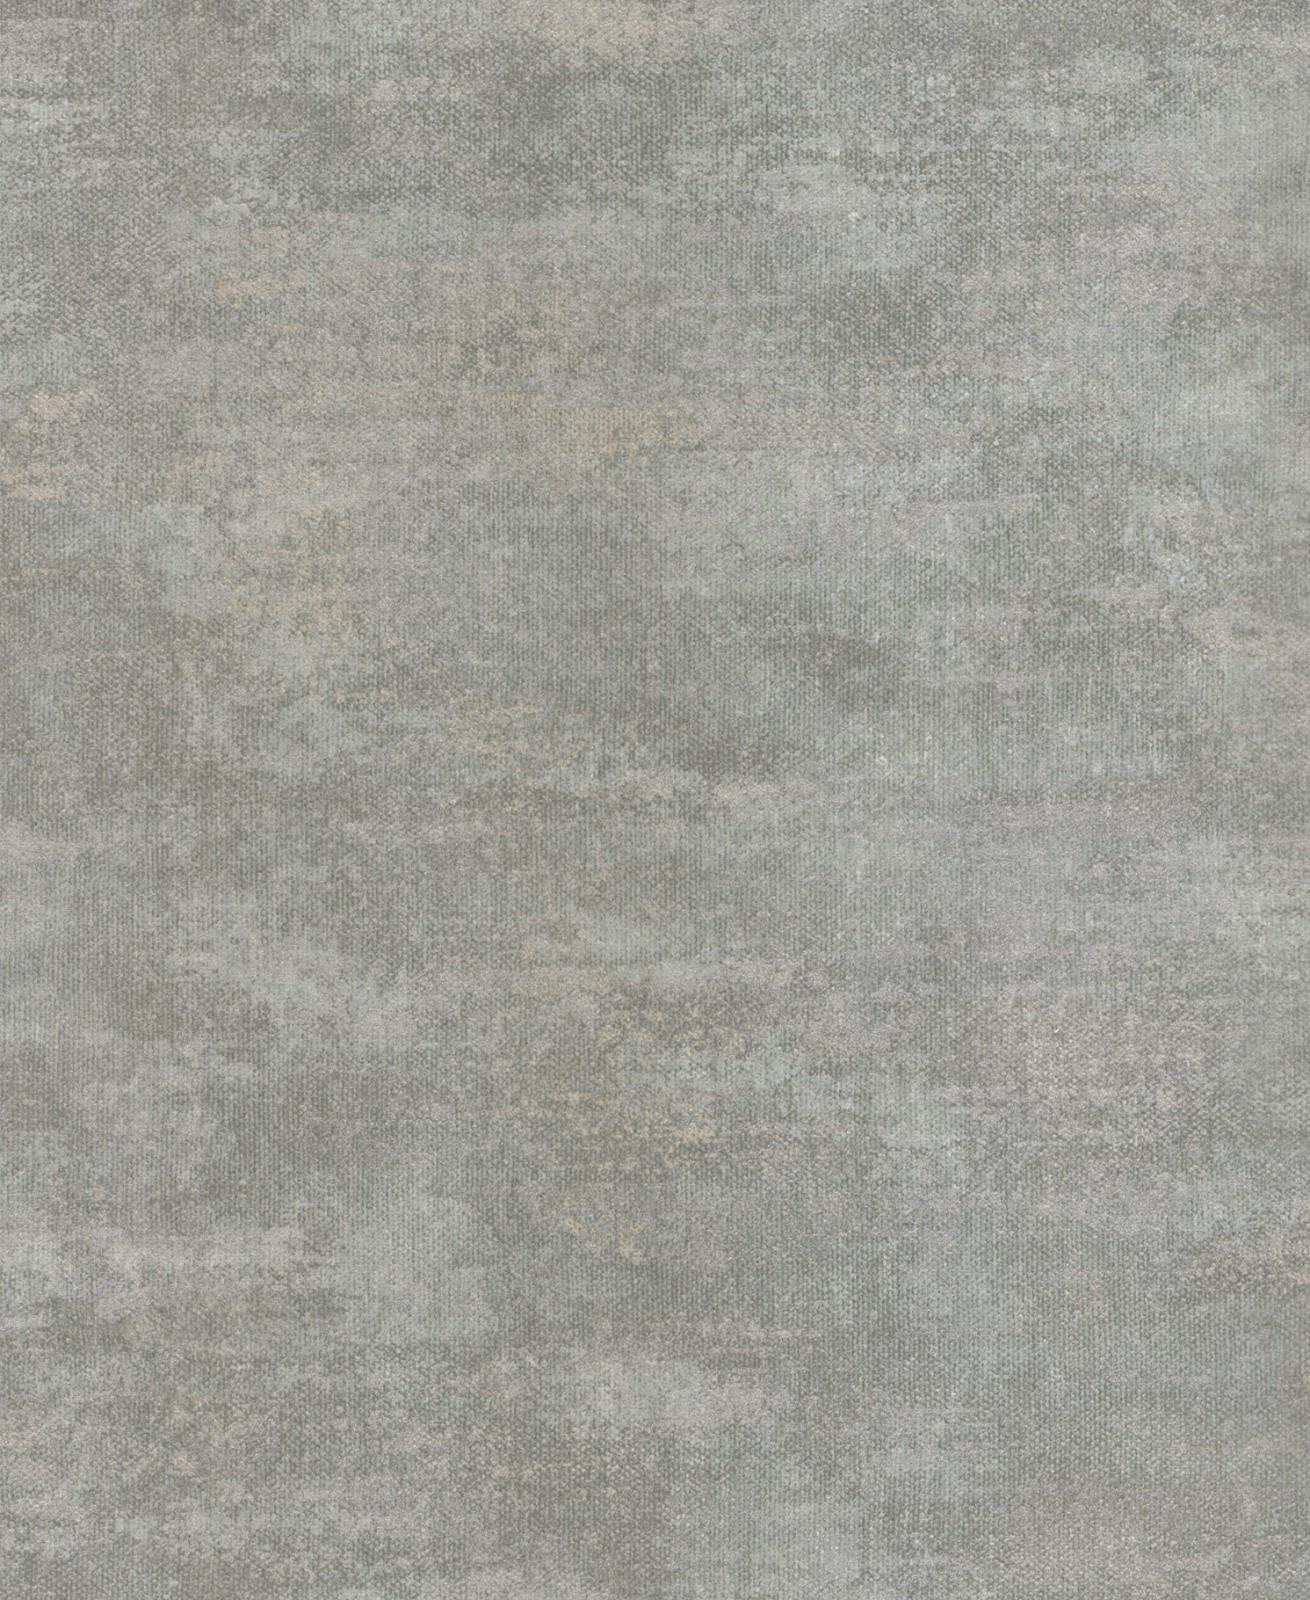 Tapete rasch textil tintura uni grau türkis 227191